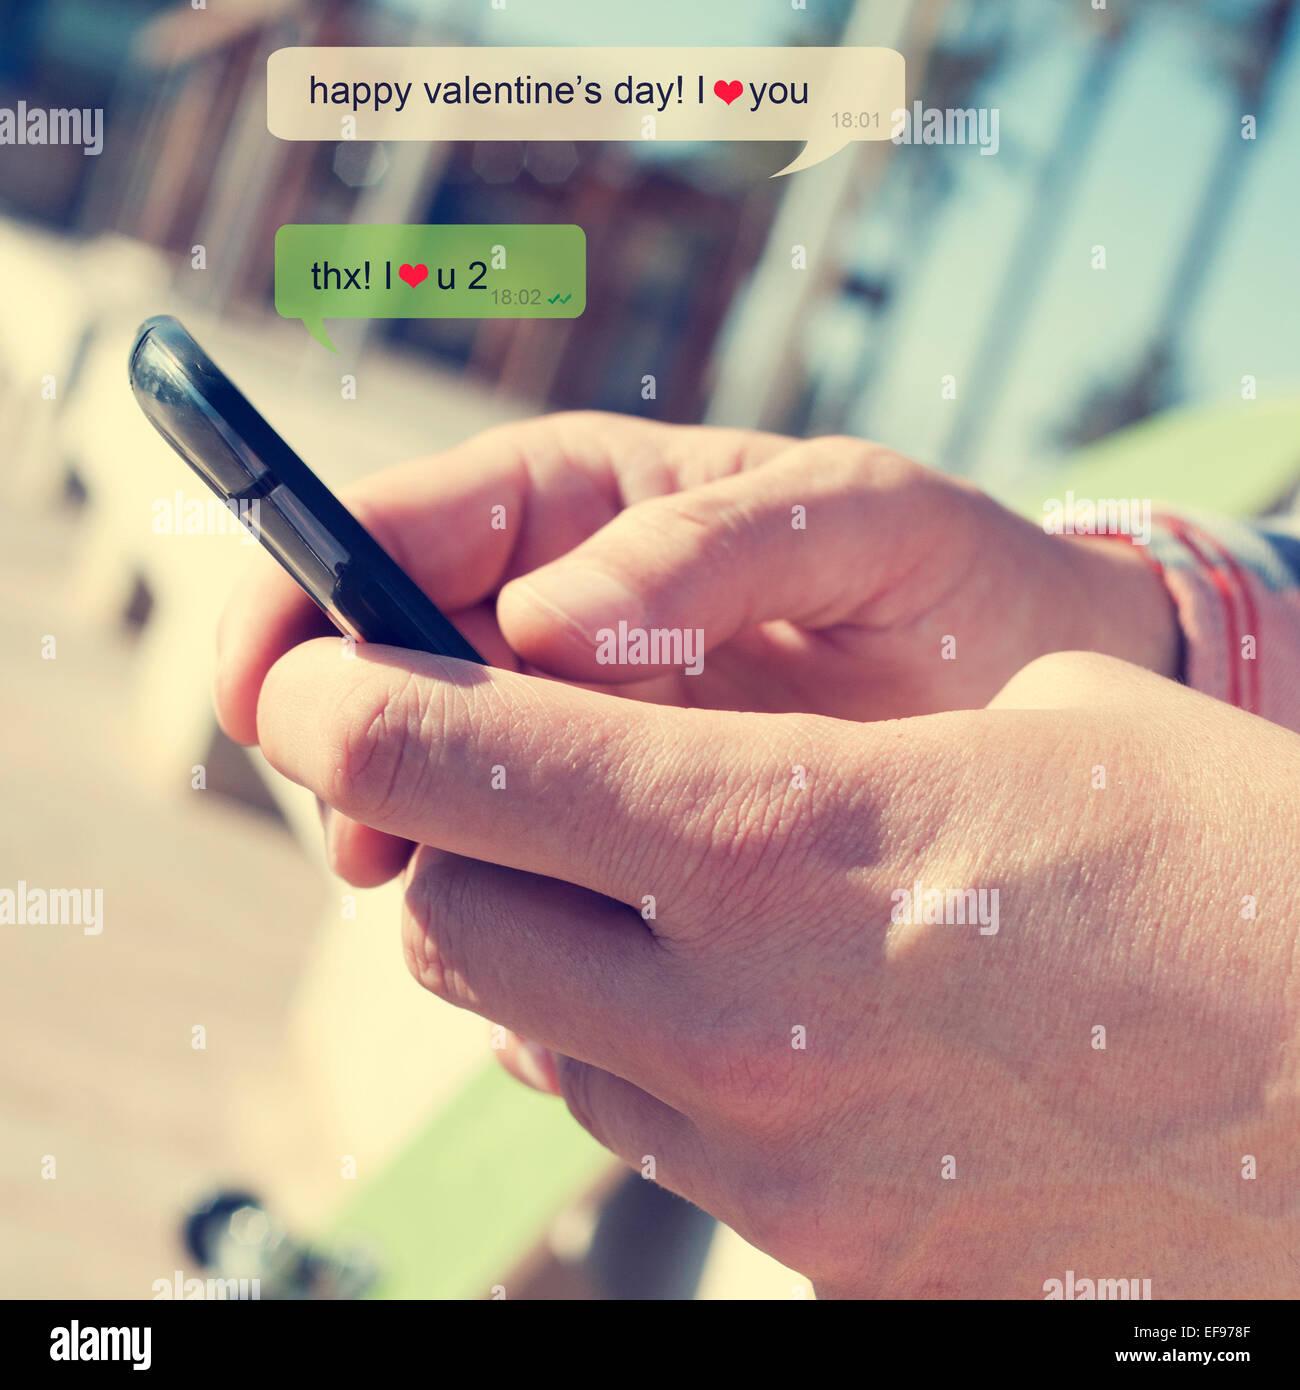 SMS Text datieren Online-Dating vs meeting in Person